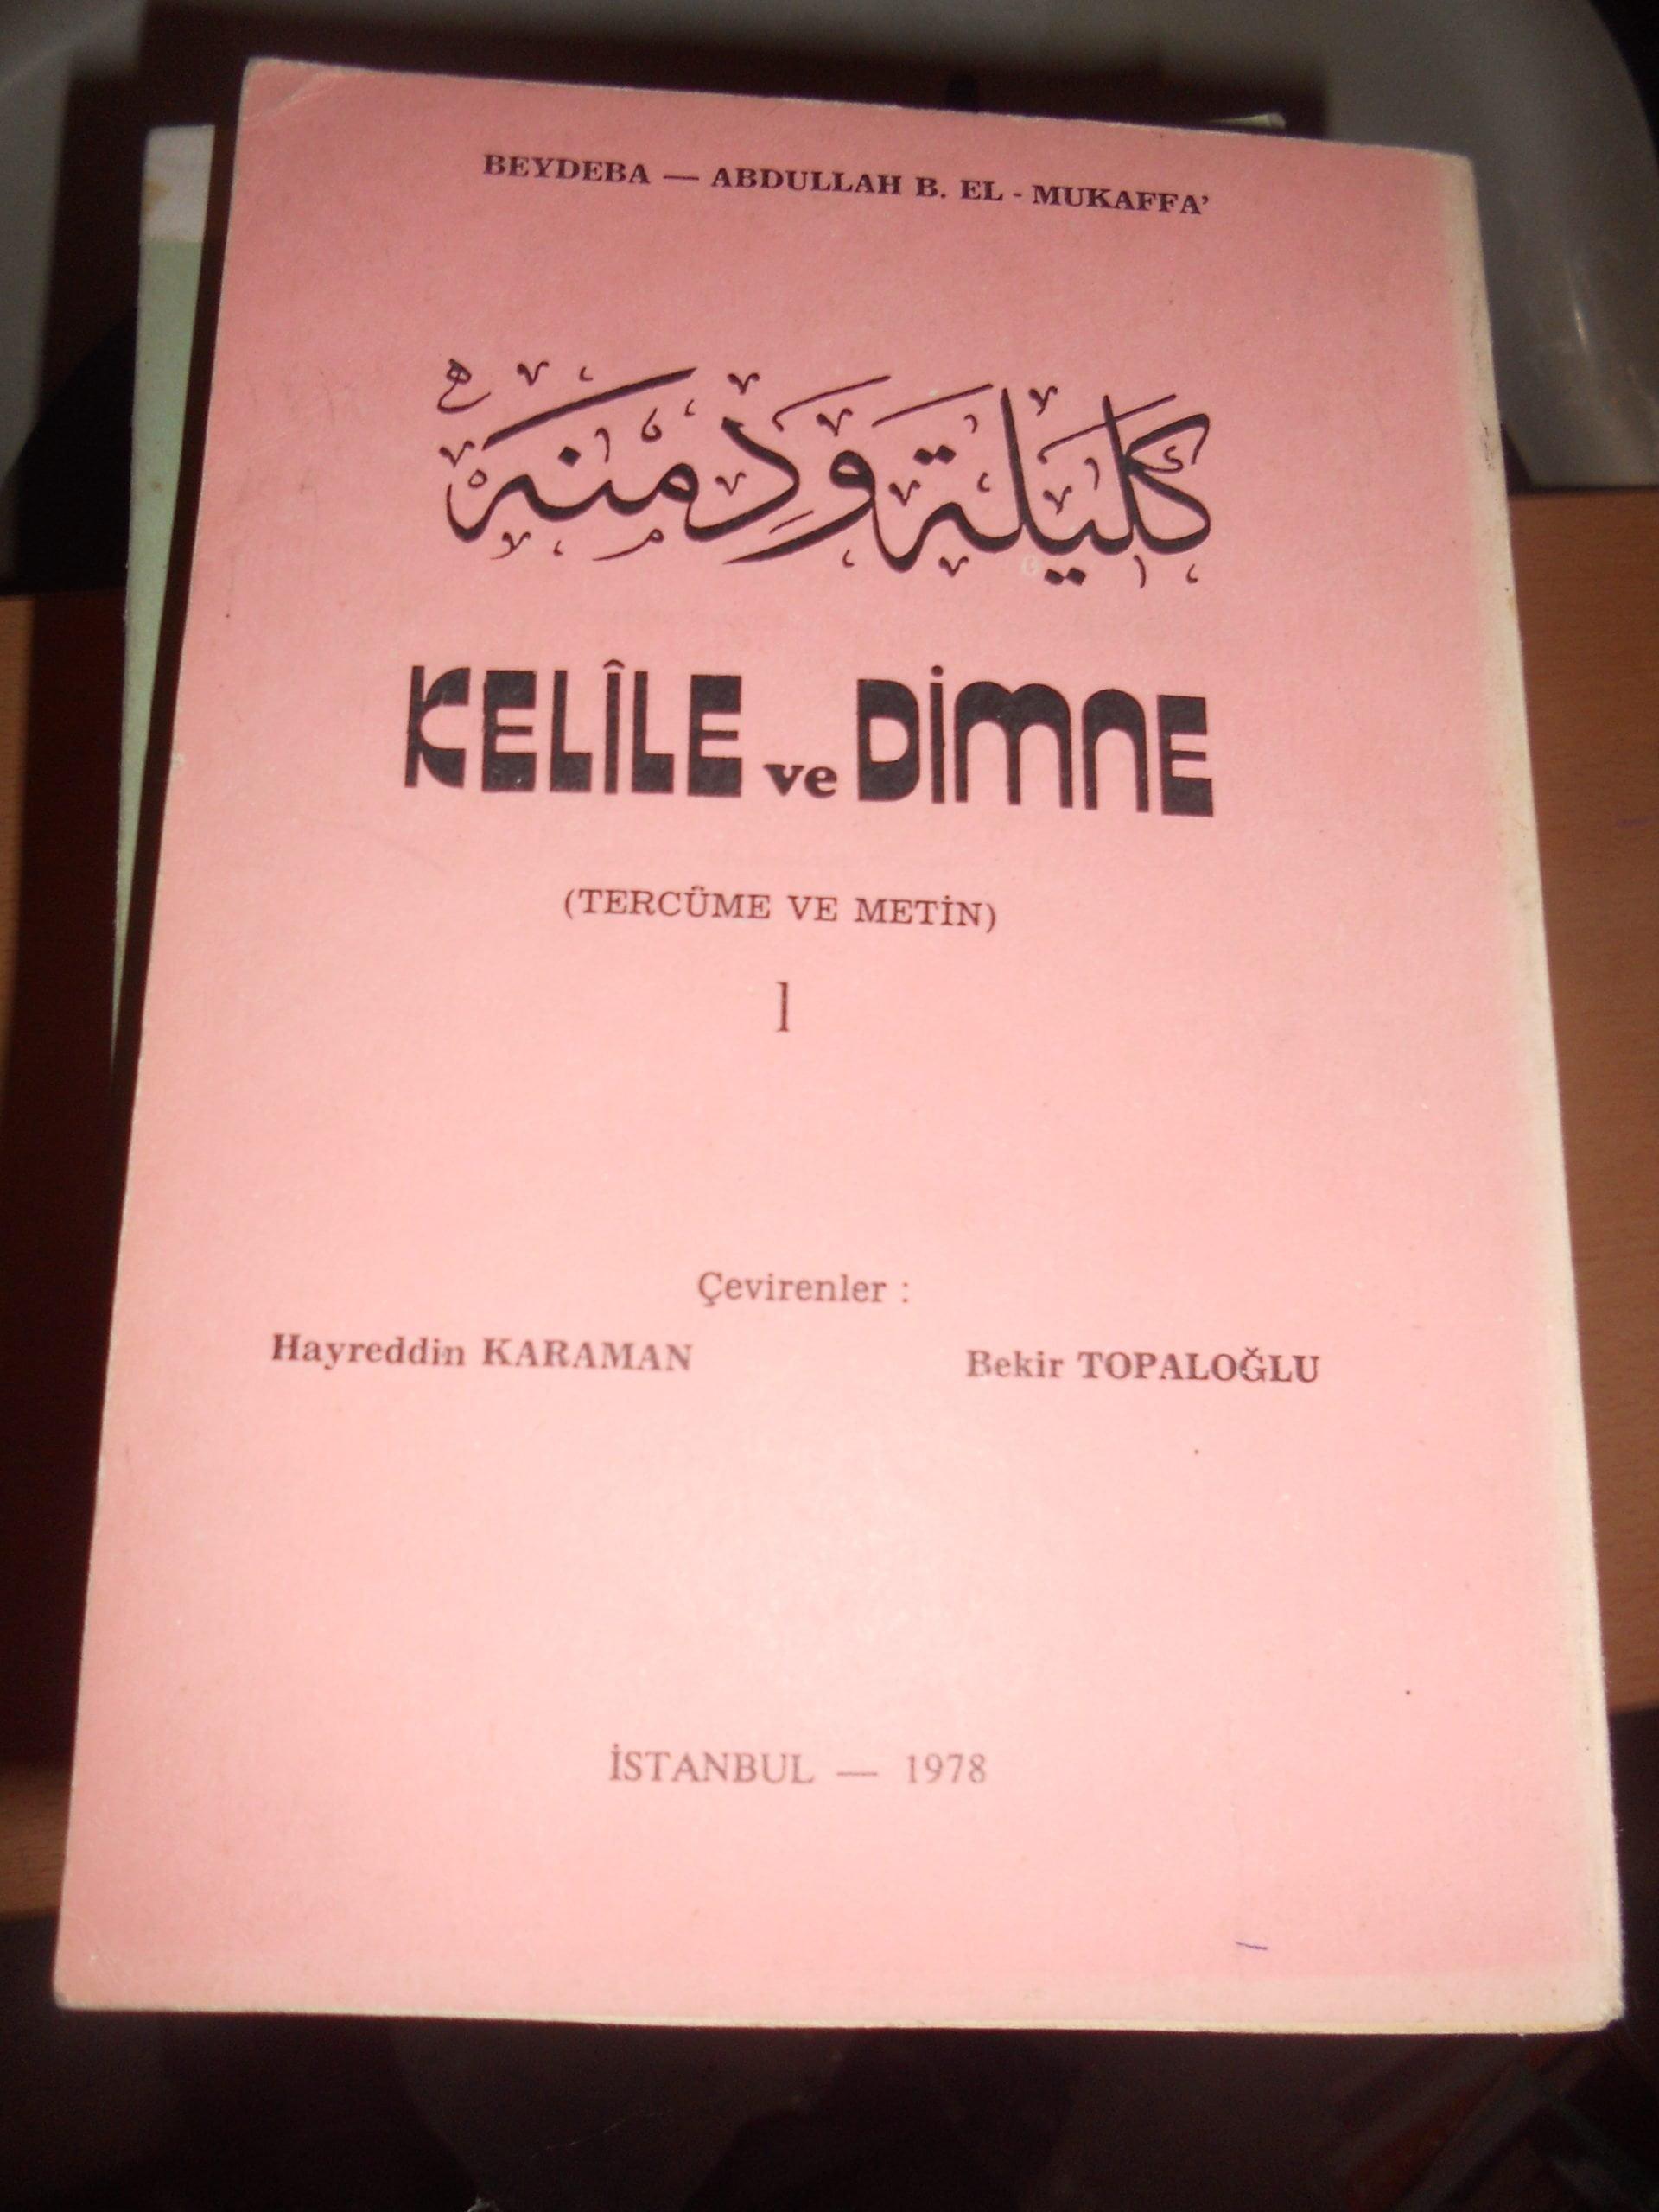 KELİLE VE DİMNE (Arapça-tercüme-metin)-1-/BEYDABA-Abdullah b.el mukaffa / 25 tl